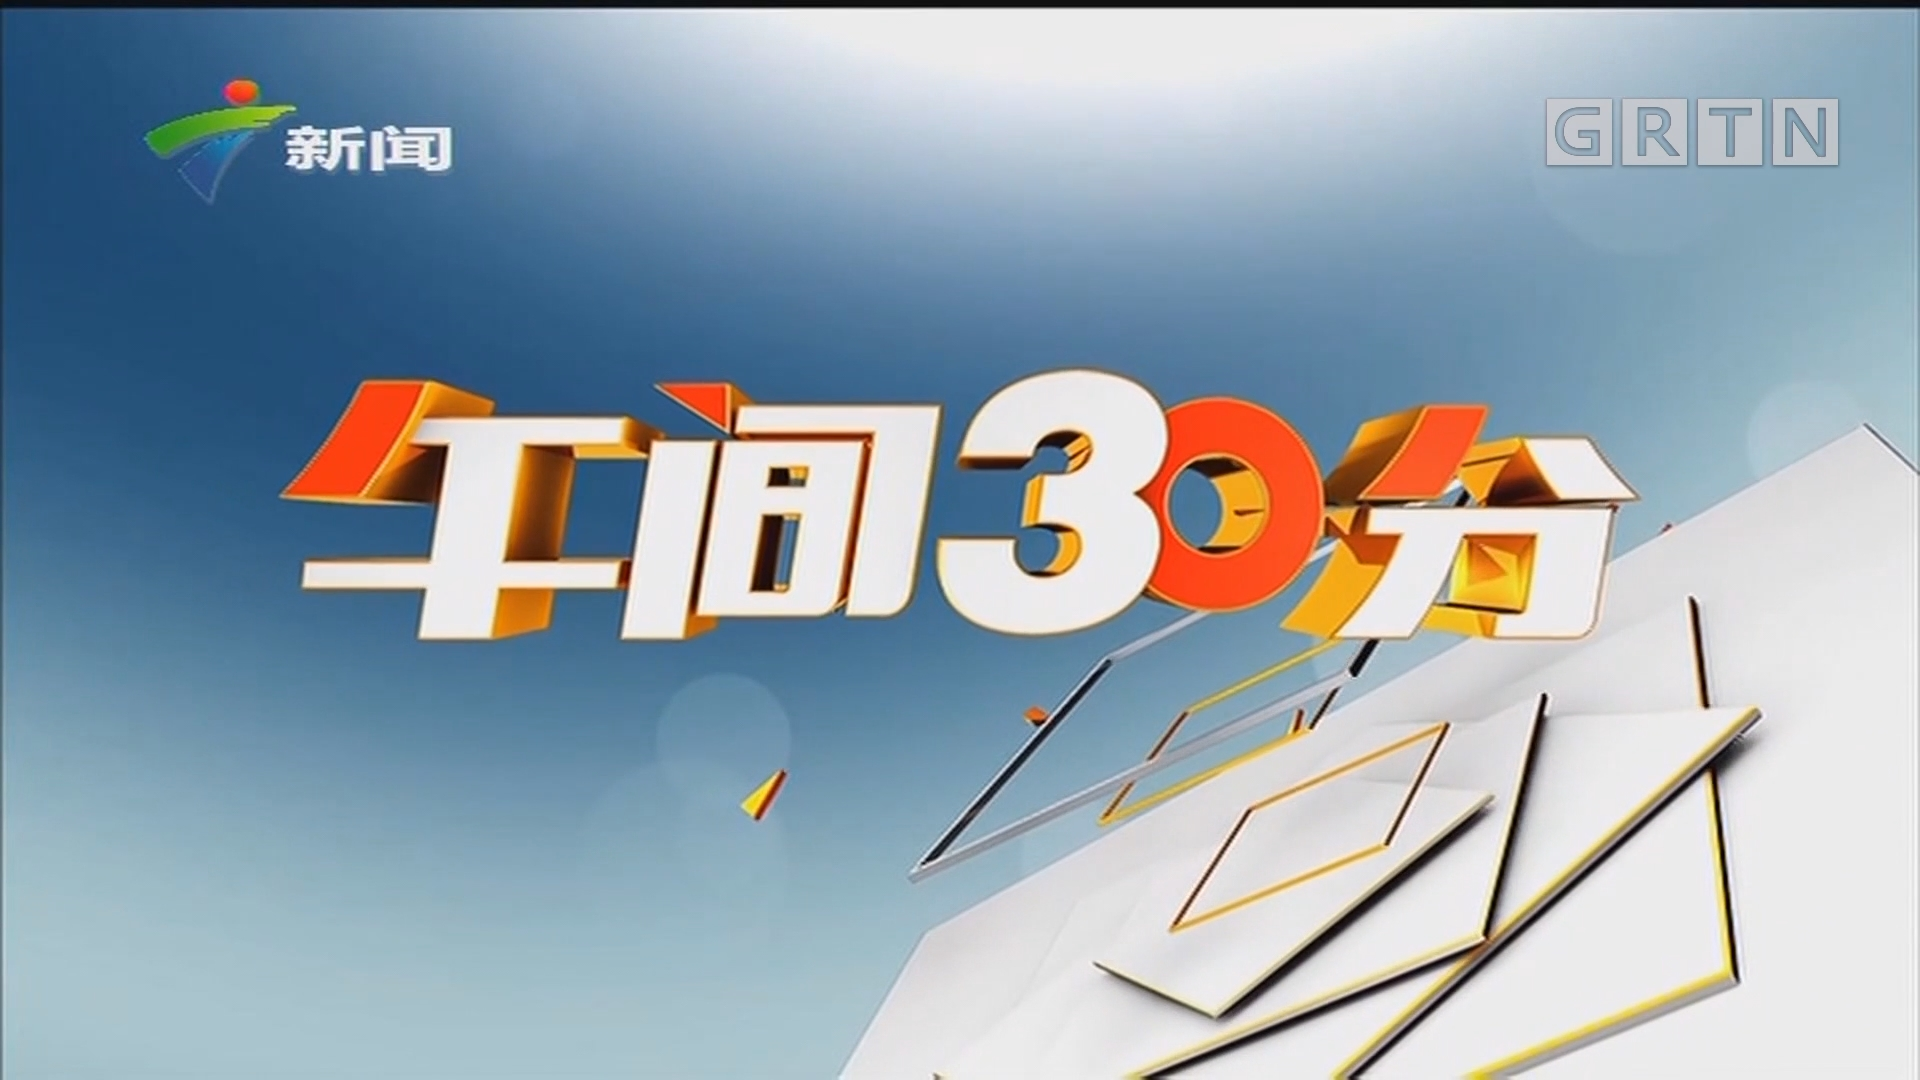 [HD][2019-09-27]午间30分:南粤大地喜迎国庆巡礼:广东举办丰富多彩活动献礼国庆祝福祖国